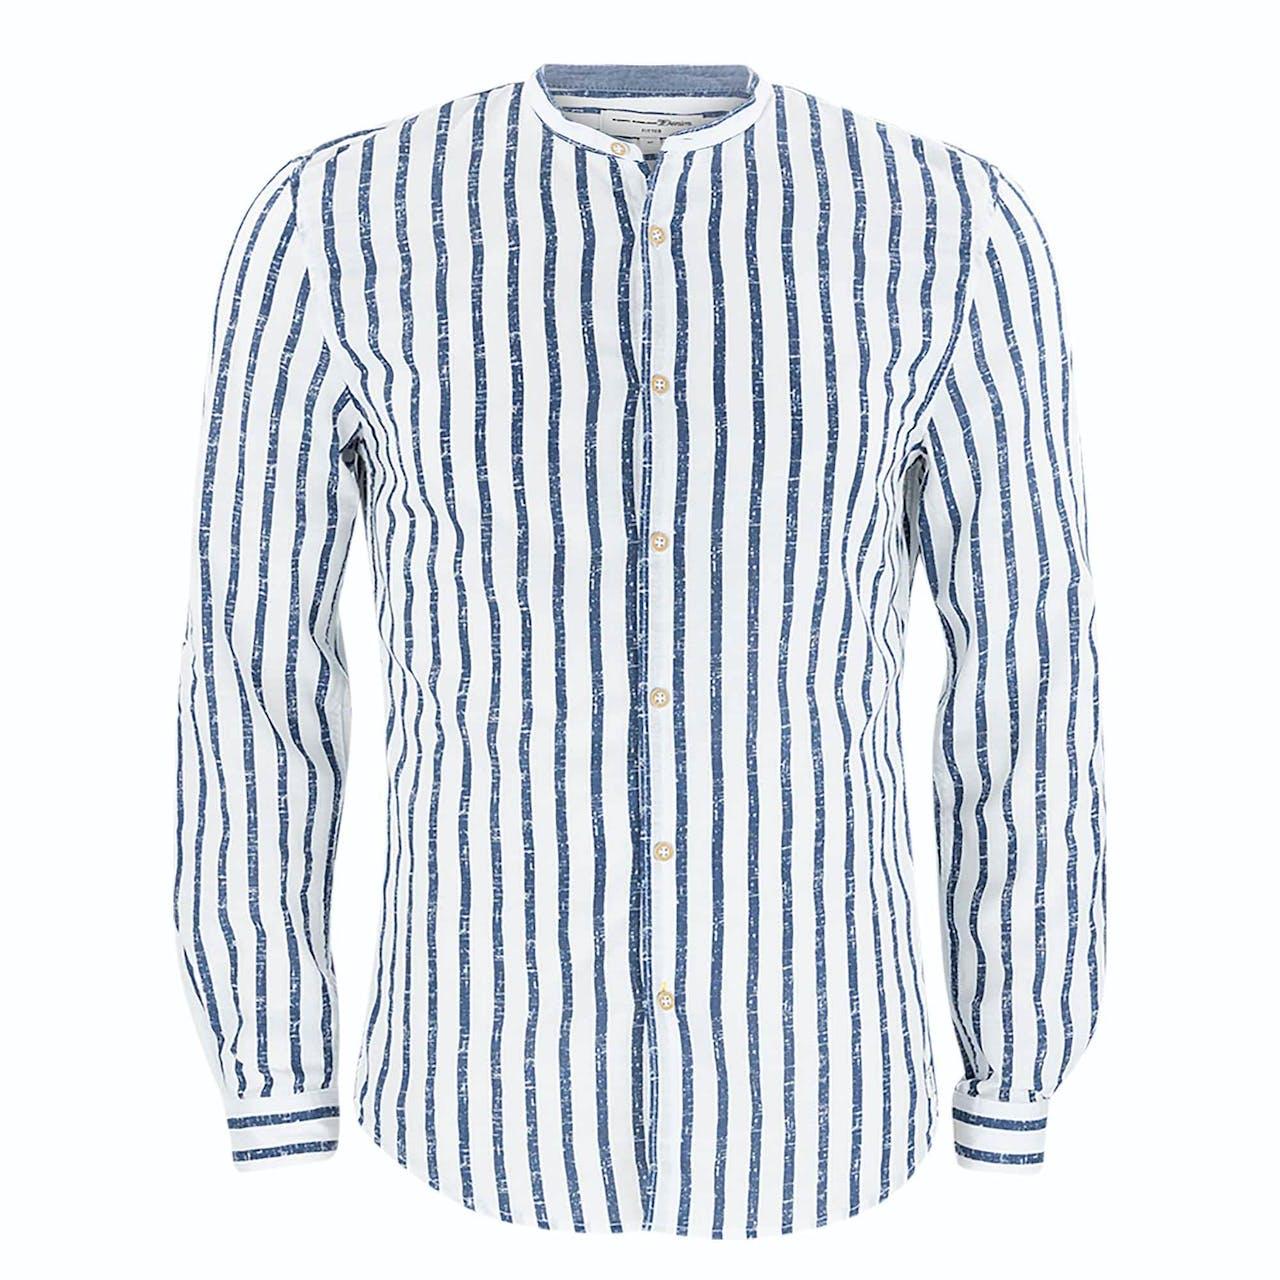 Freizeithemd - Fitted - Stripes